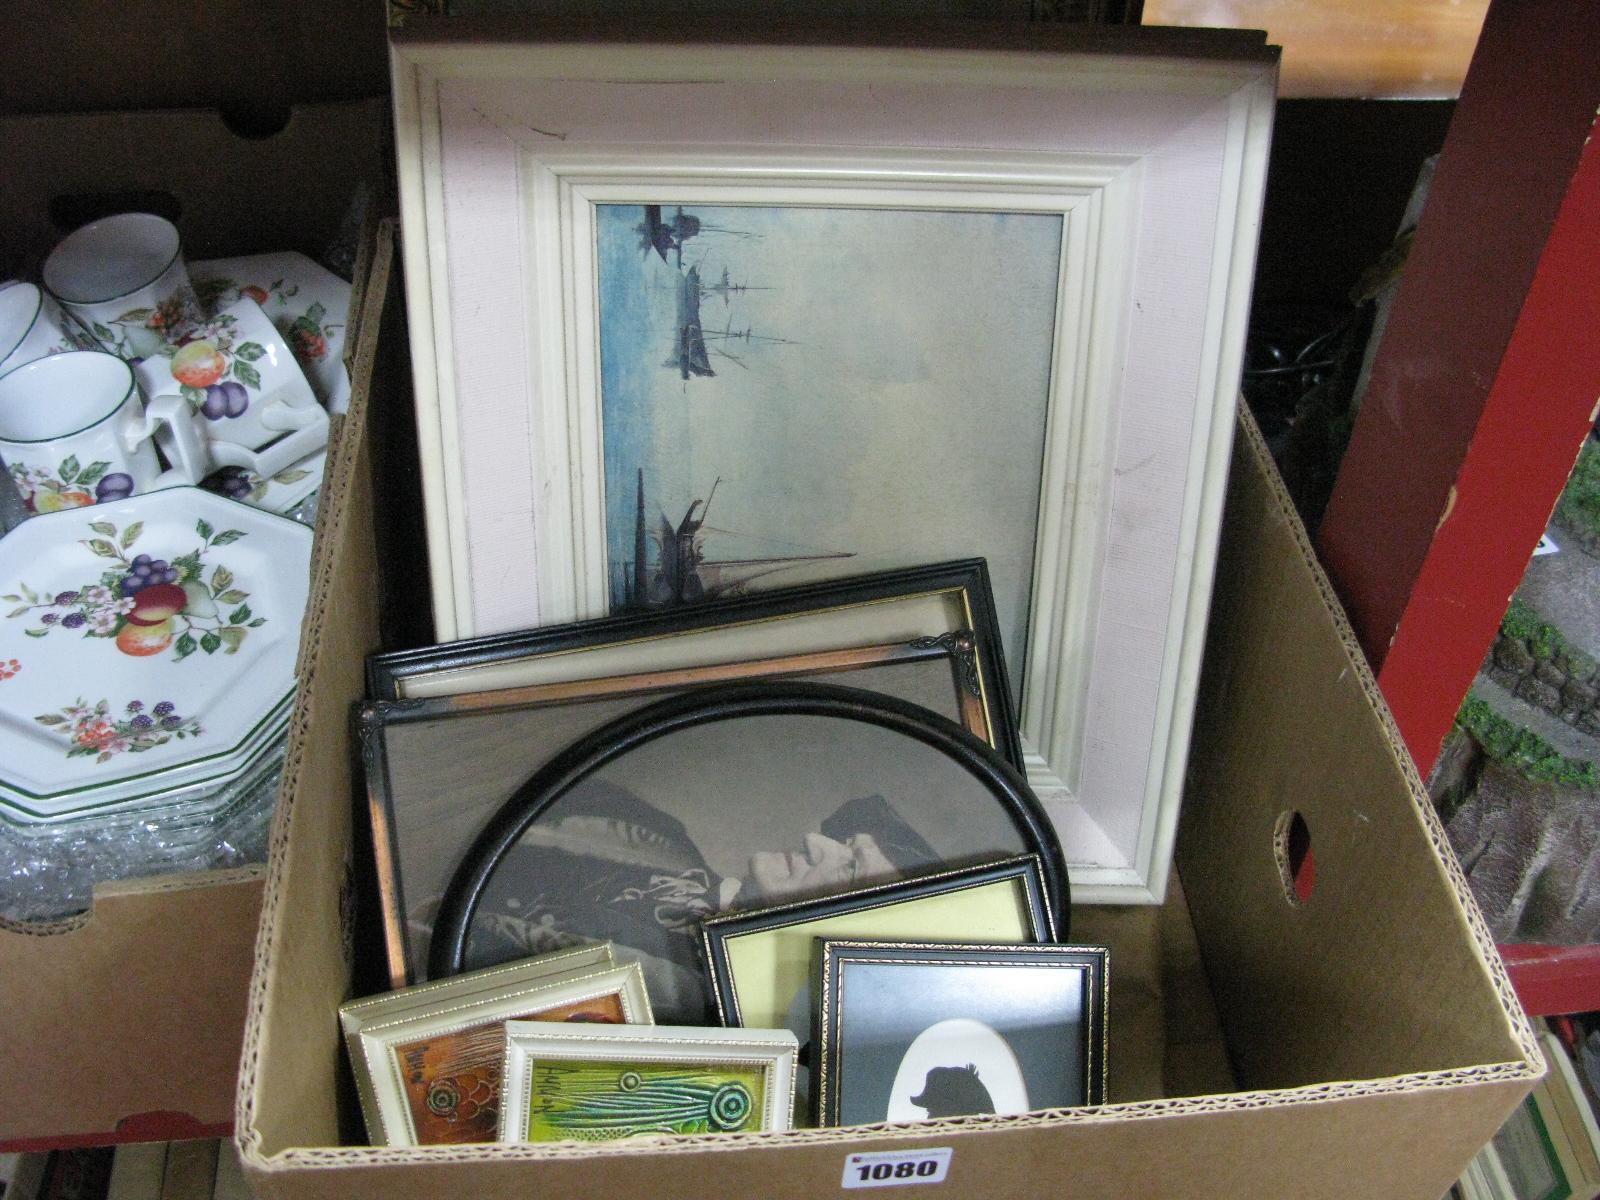 Lot 1080 - Silhouettes, Coach Inn tapestry, prints, mirror, etc:- One Box